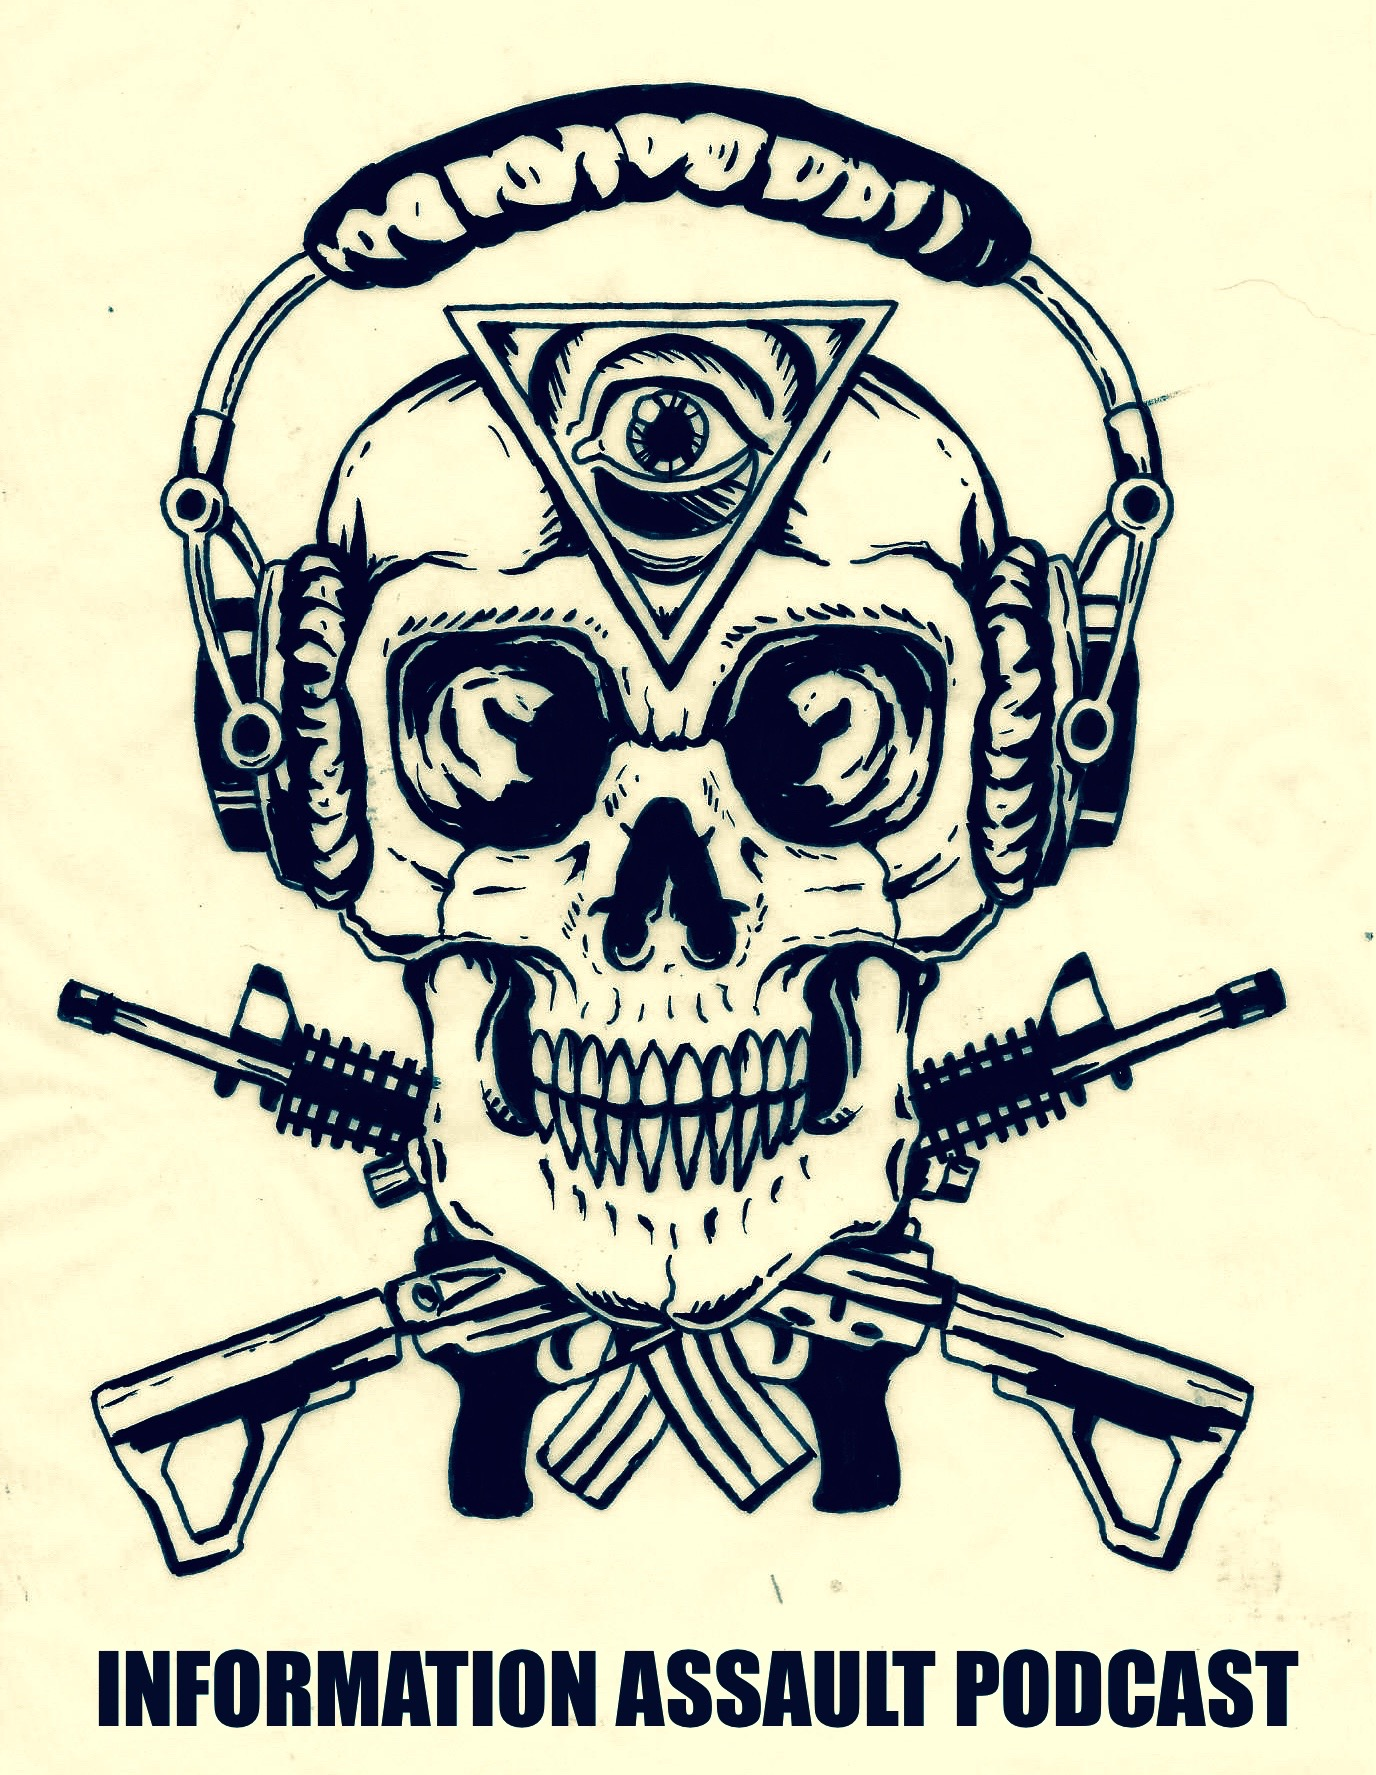 Information Assault Podcast - Information Assault